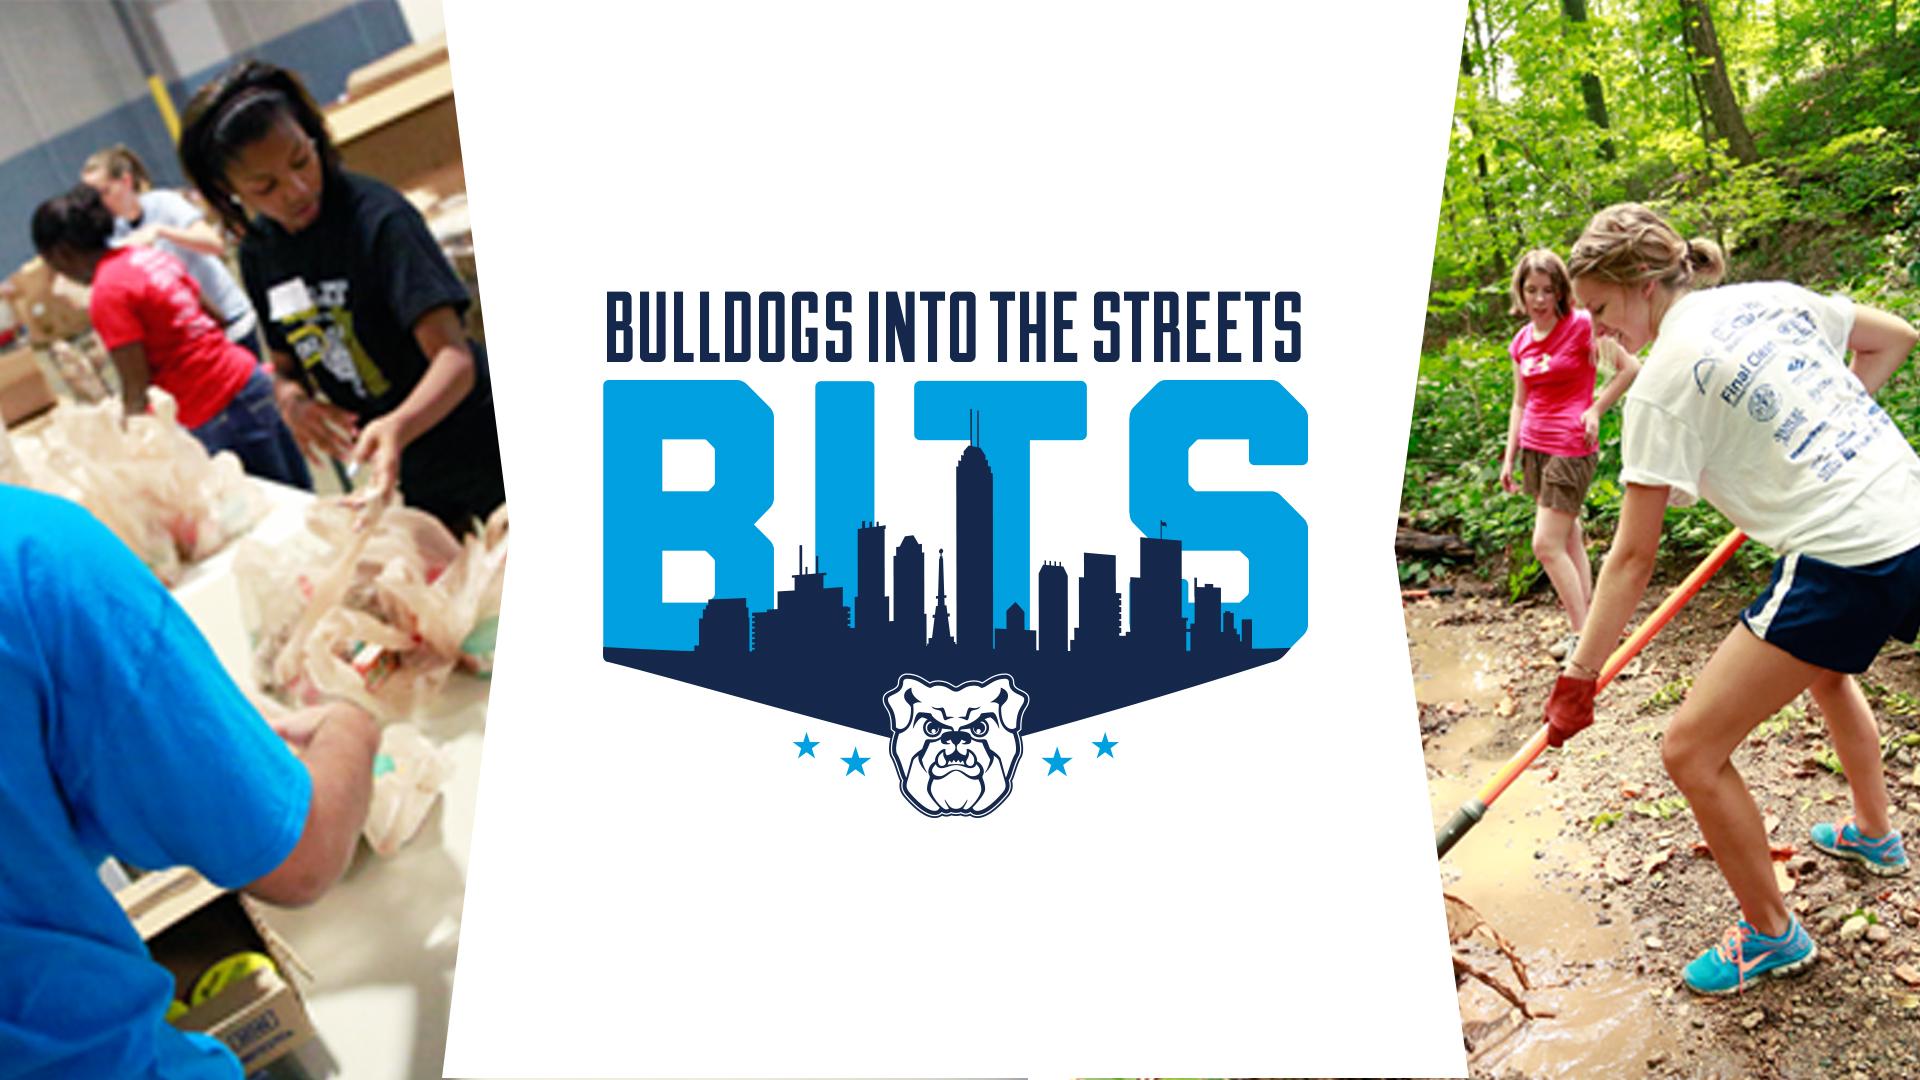 Detroit Bulldogs Into The Streets (BITS)